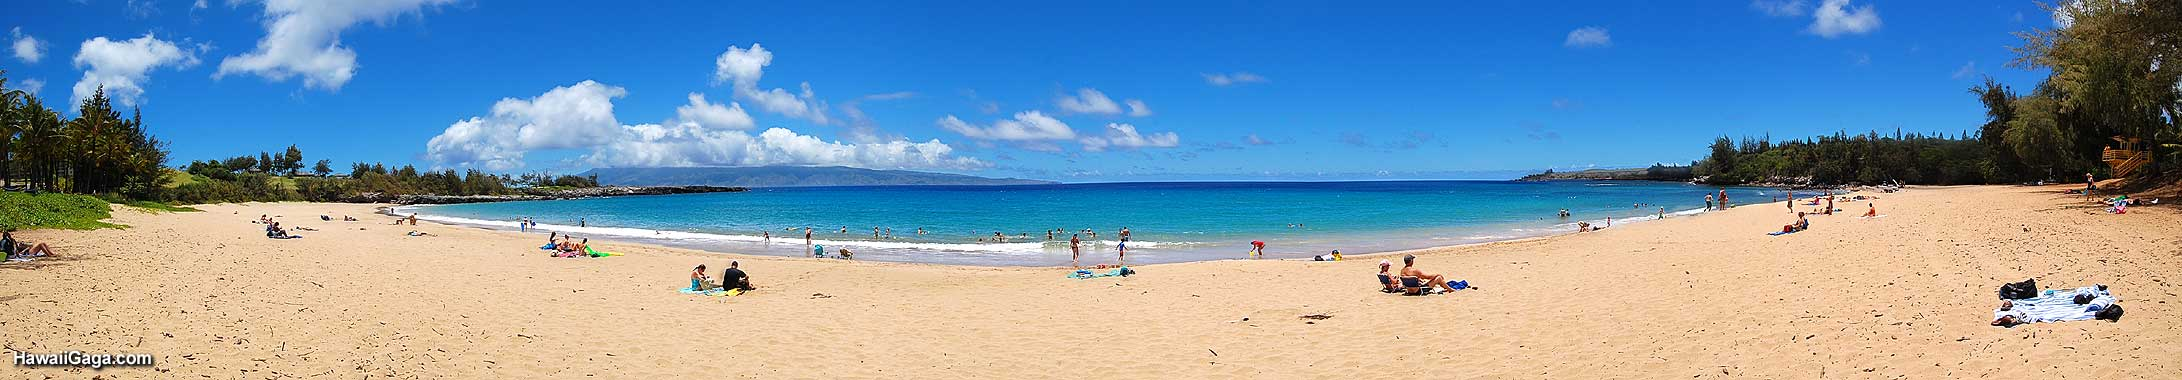 Dt Flemming Beach Park Maui